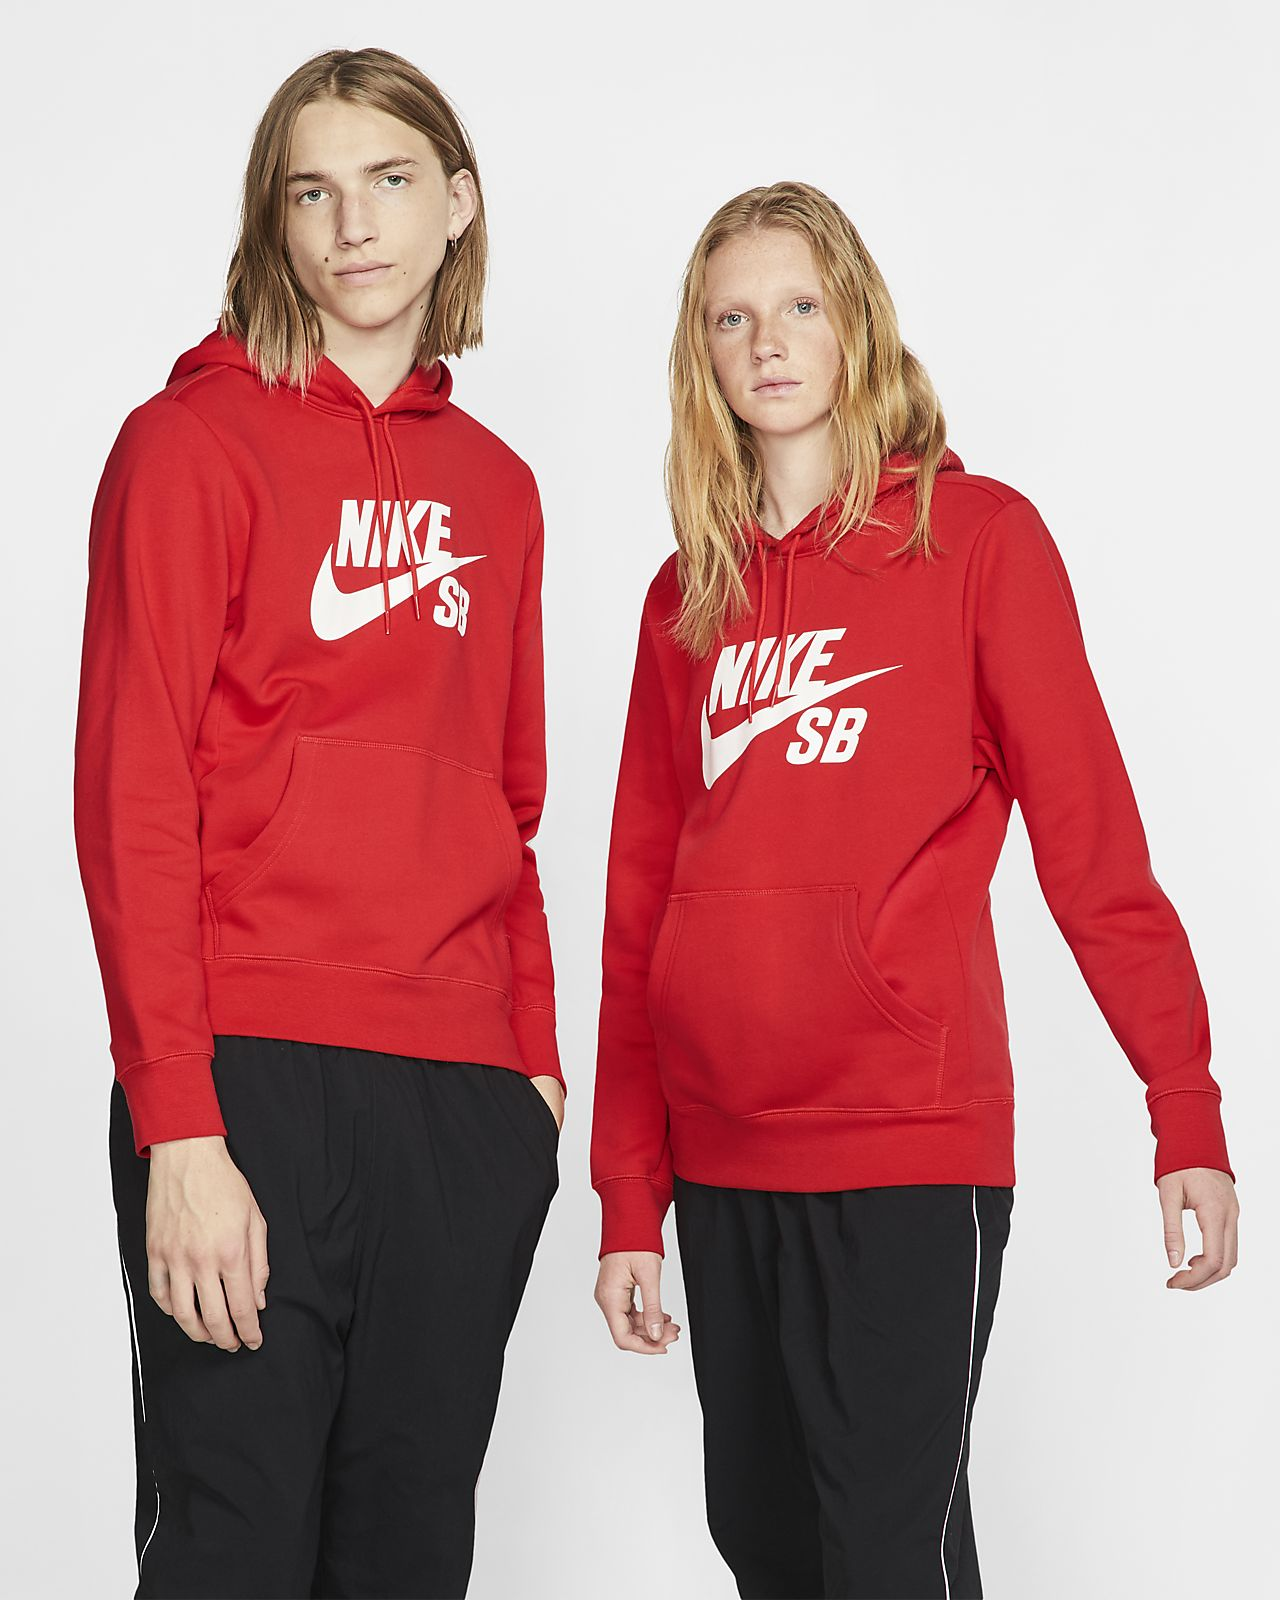 4977b7ebe3d7 Nike SB Icon Men s Pullover Skate Hoodie. Nike.com NL